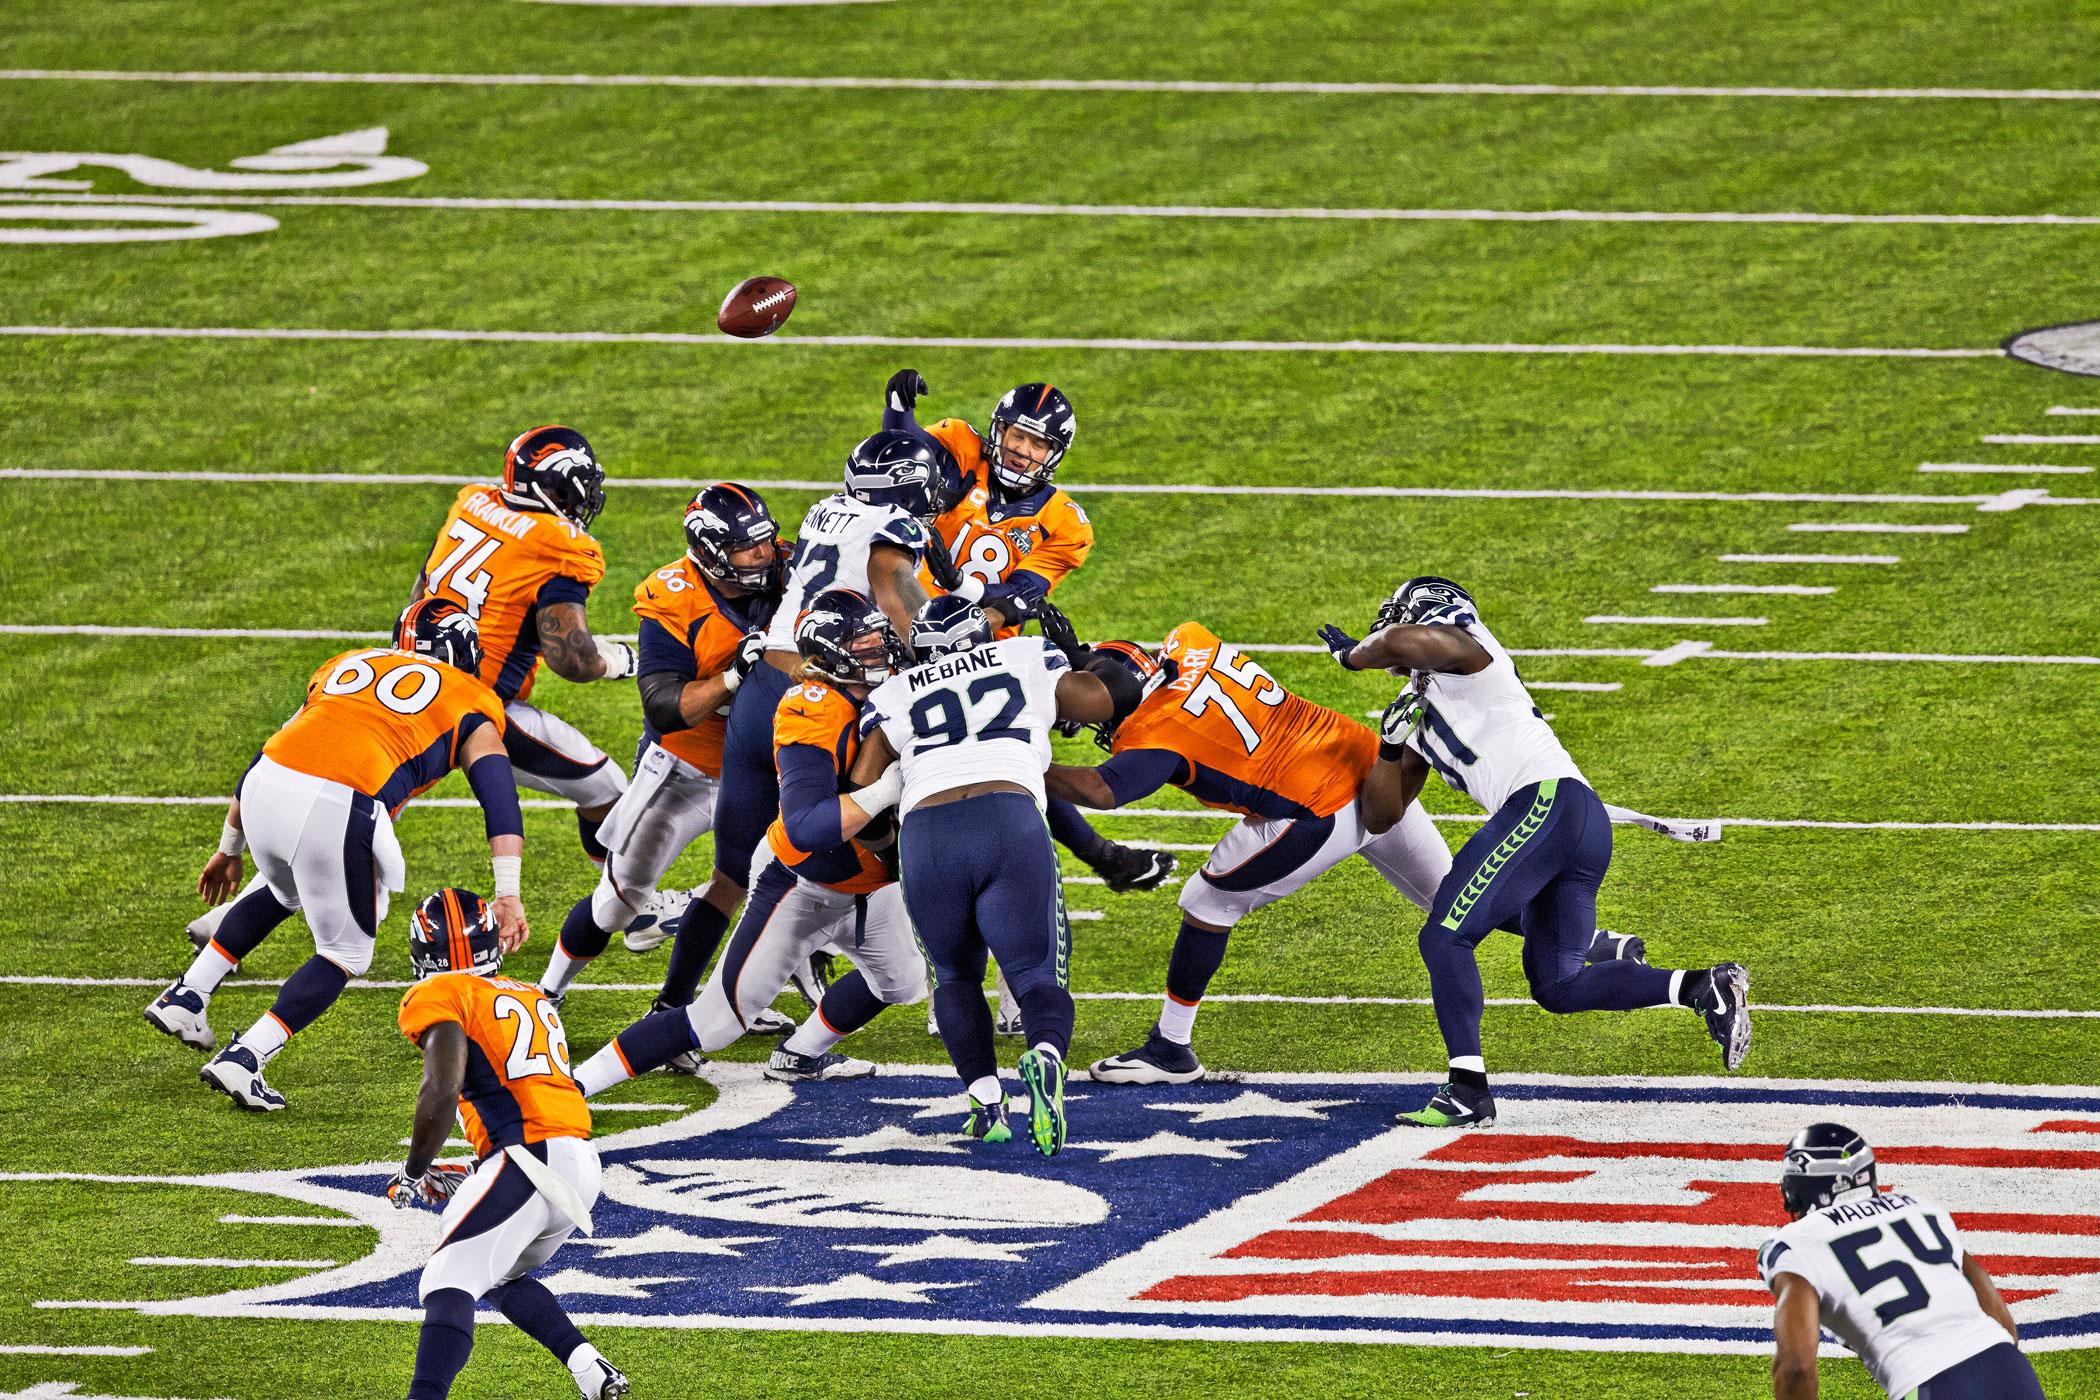 Super Bowl XLVIII, Feb. 2, 2014                               Seattle Seahawks vs. Denver Broncos in East Rutherford, N.J.